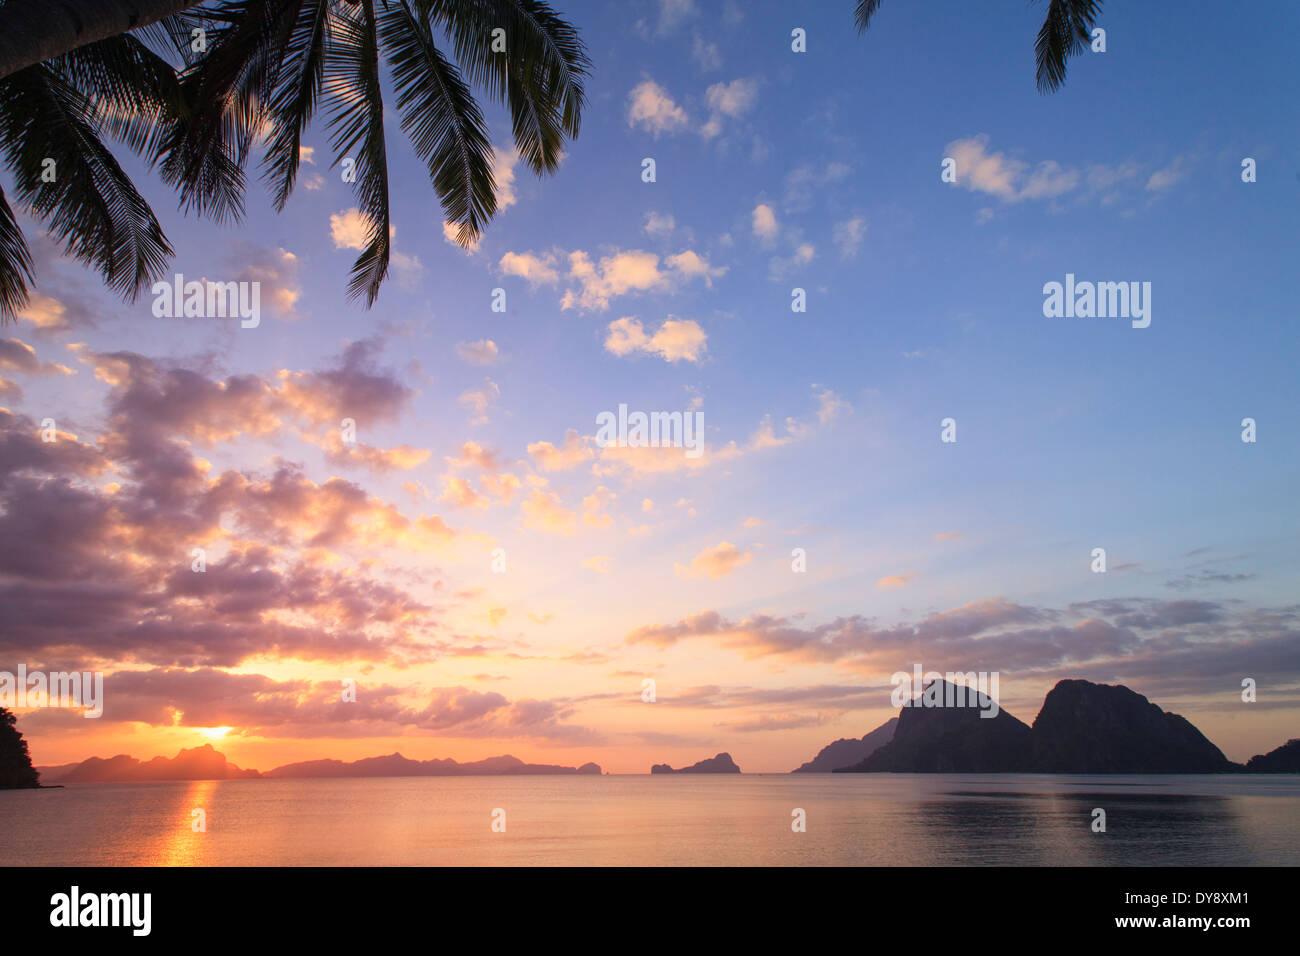 Philippines, Palawan, El Nido, Bay, Marimegmeg Beach (Las Cabanas Beach) - Stock Image